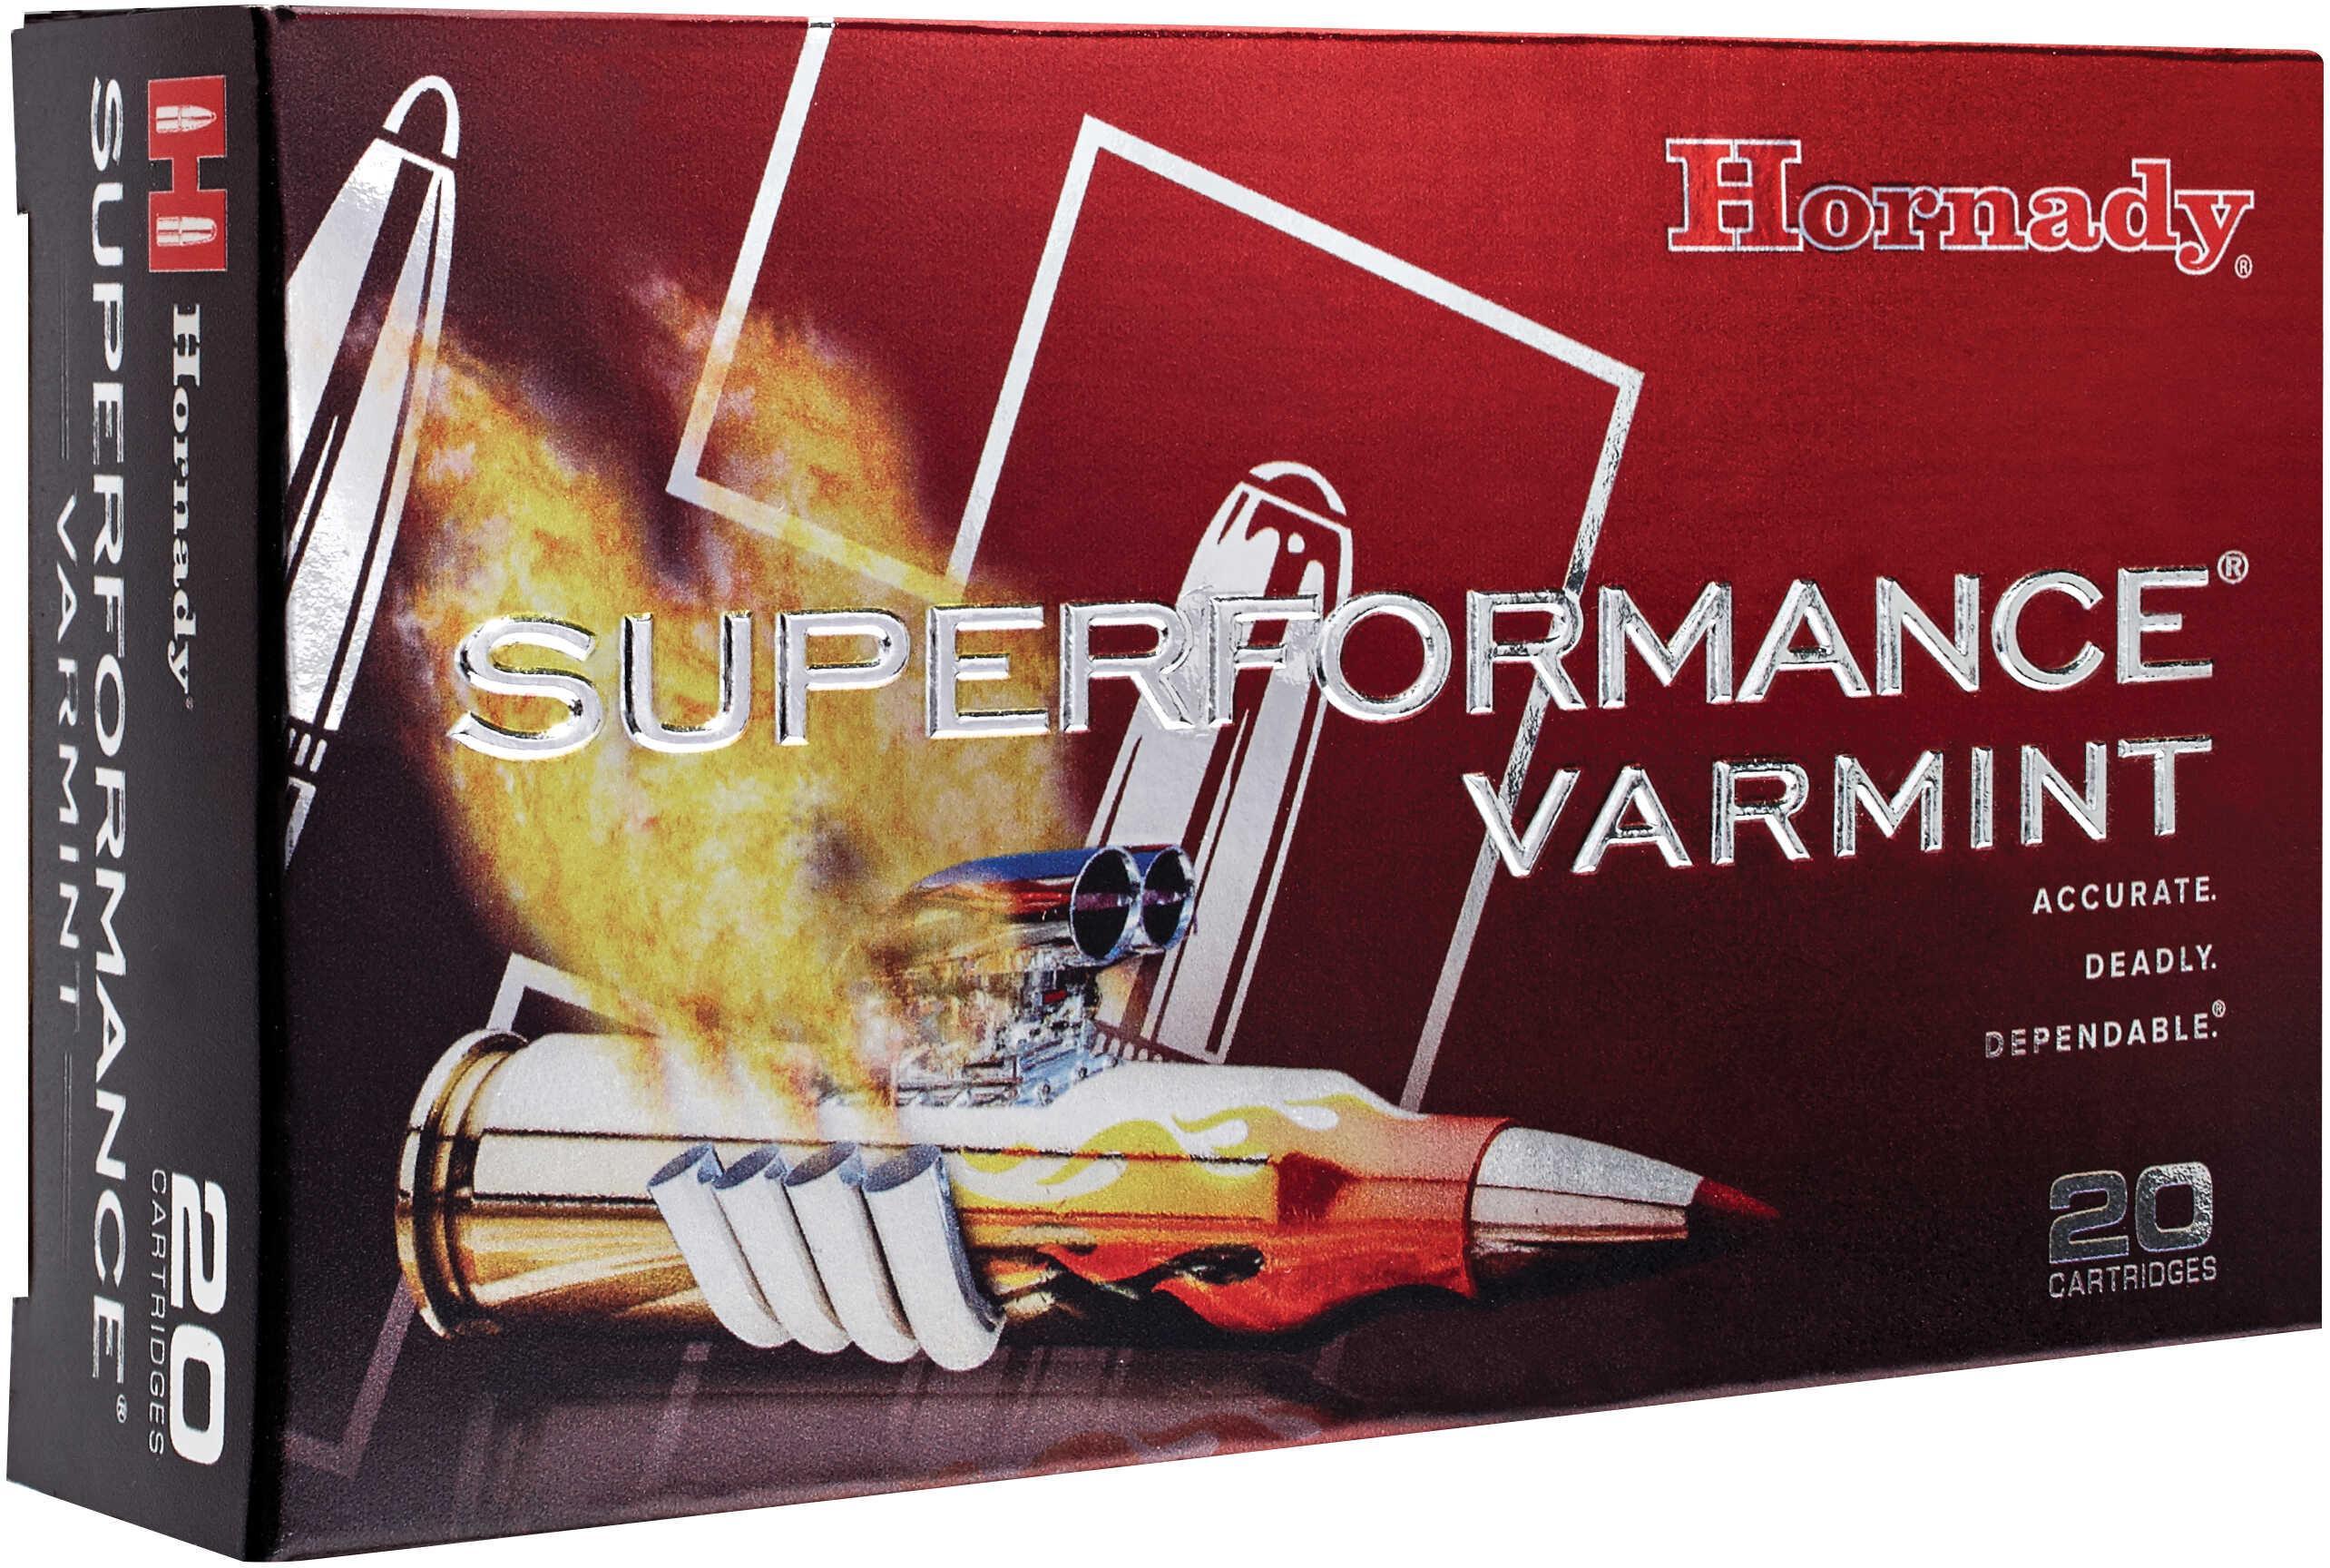 Hornady 222 Remington 50 Grain V-Max SuPerformance Varmint (Per 20 Rounds) Md: 8316 Ammunition